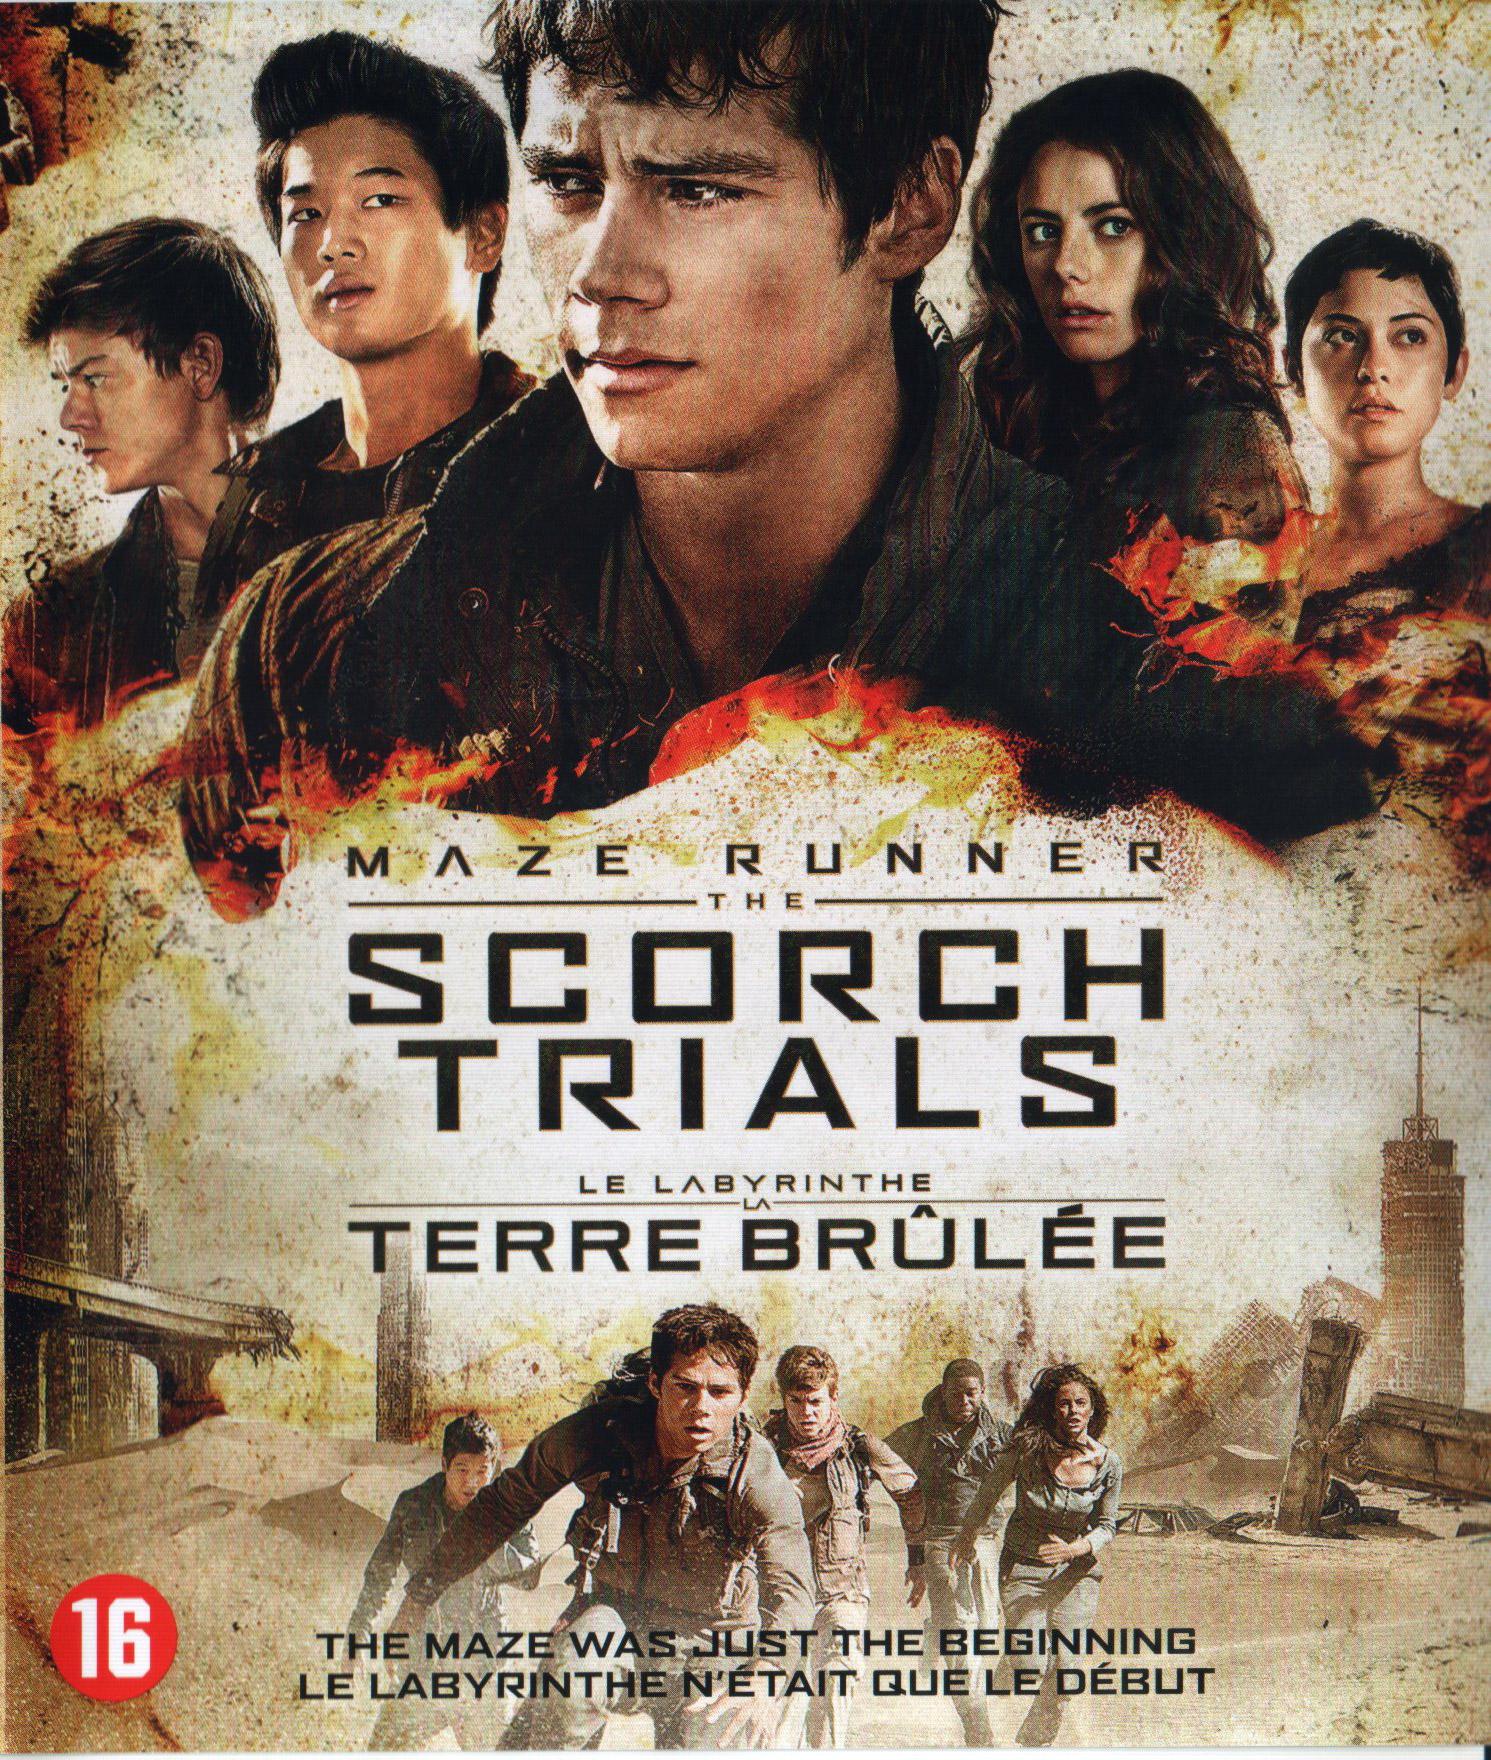 Maze Runner: The Scorch Trials (Blu-ray) - Allesoverfilm